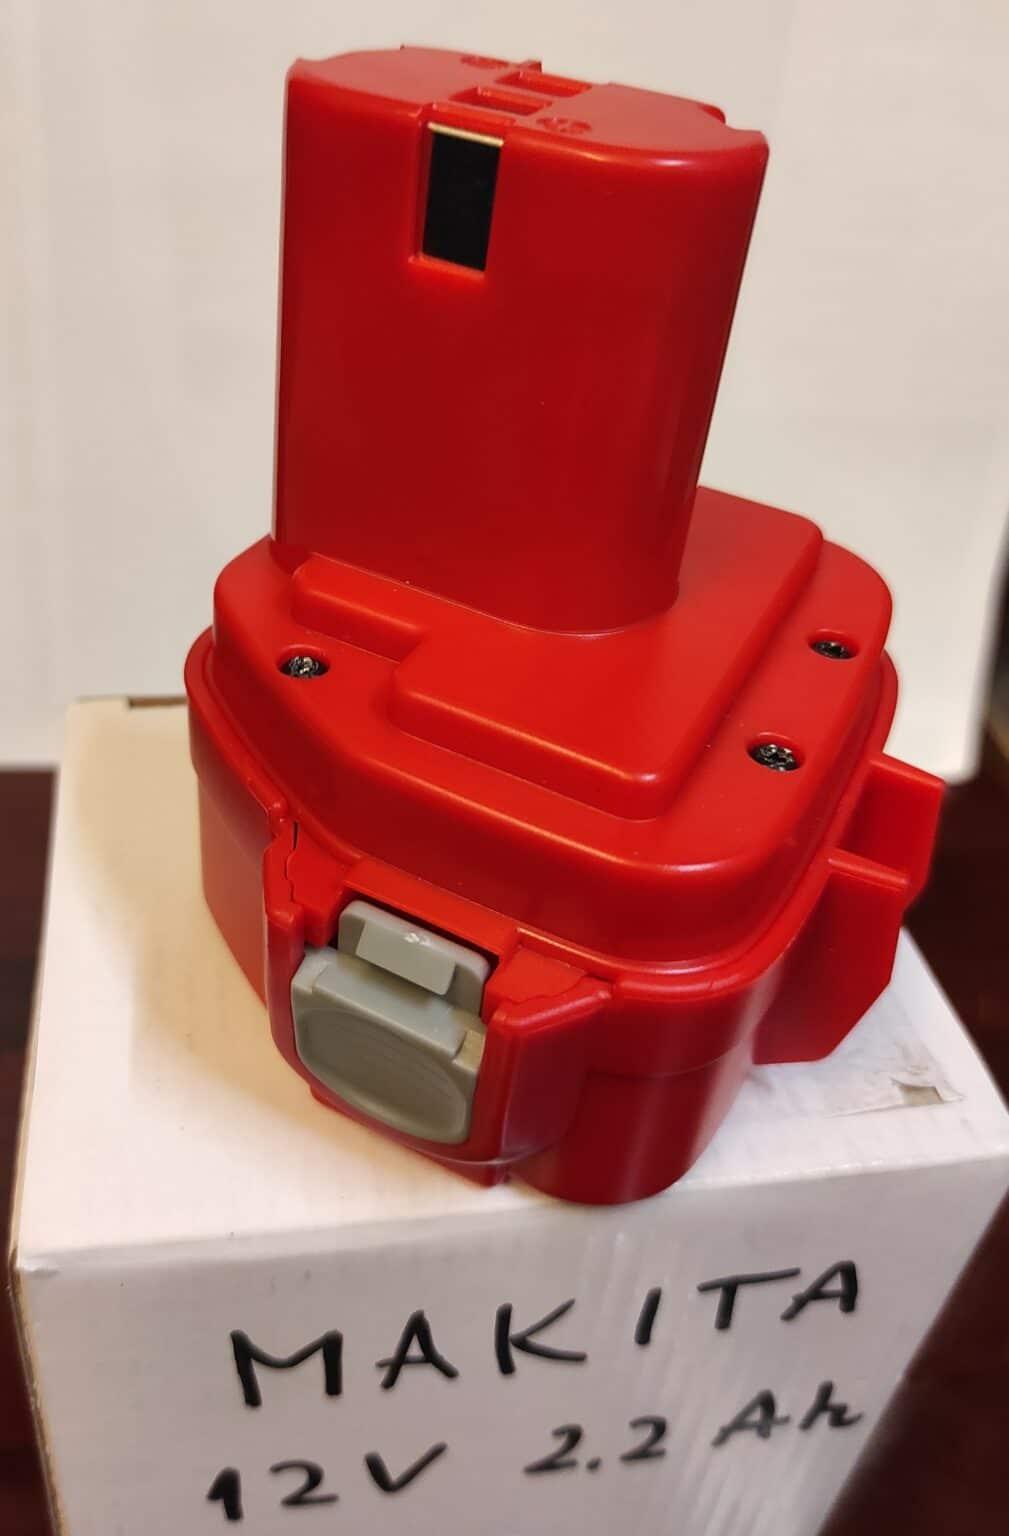 12V Ni-Mh Battery for MAKITA 192698-8 193157-5, Replaced